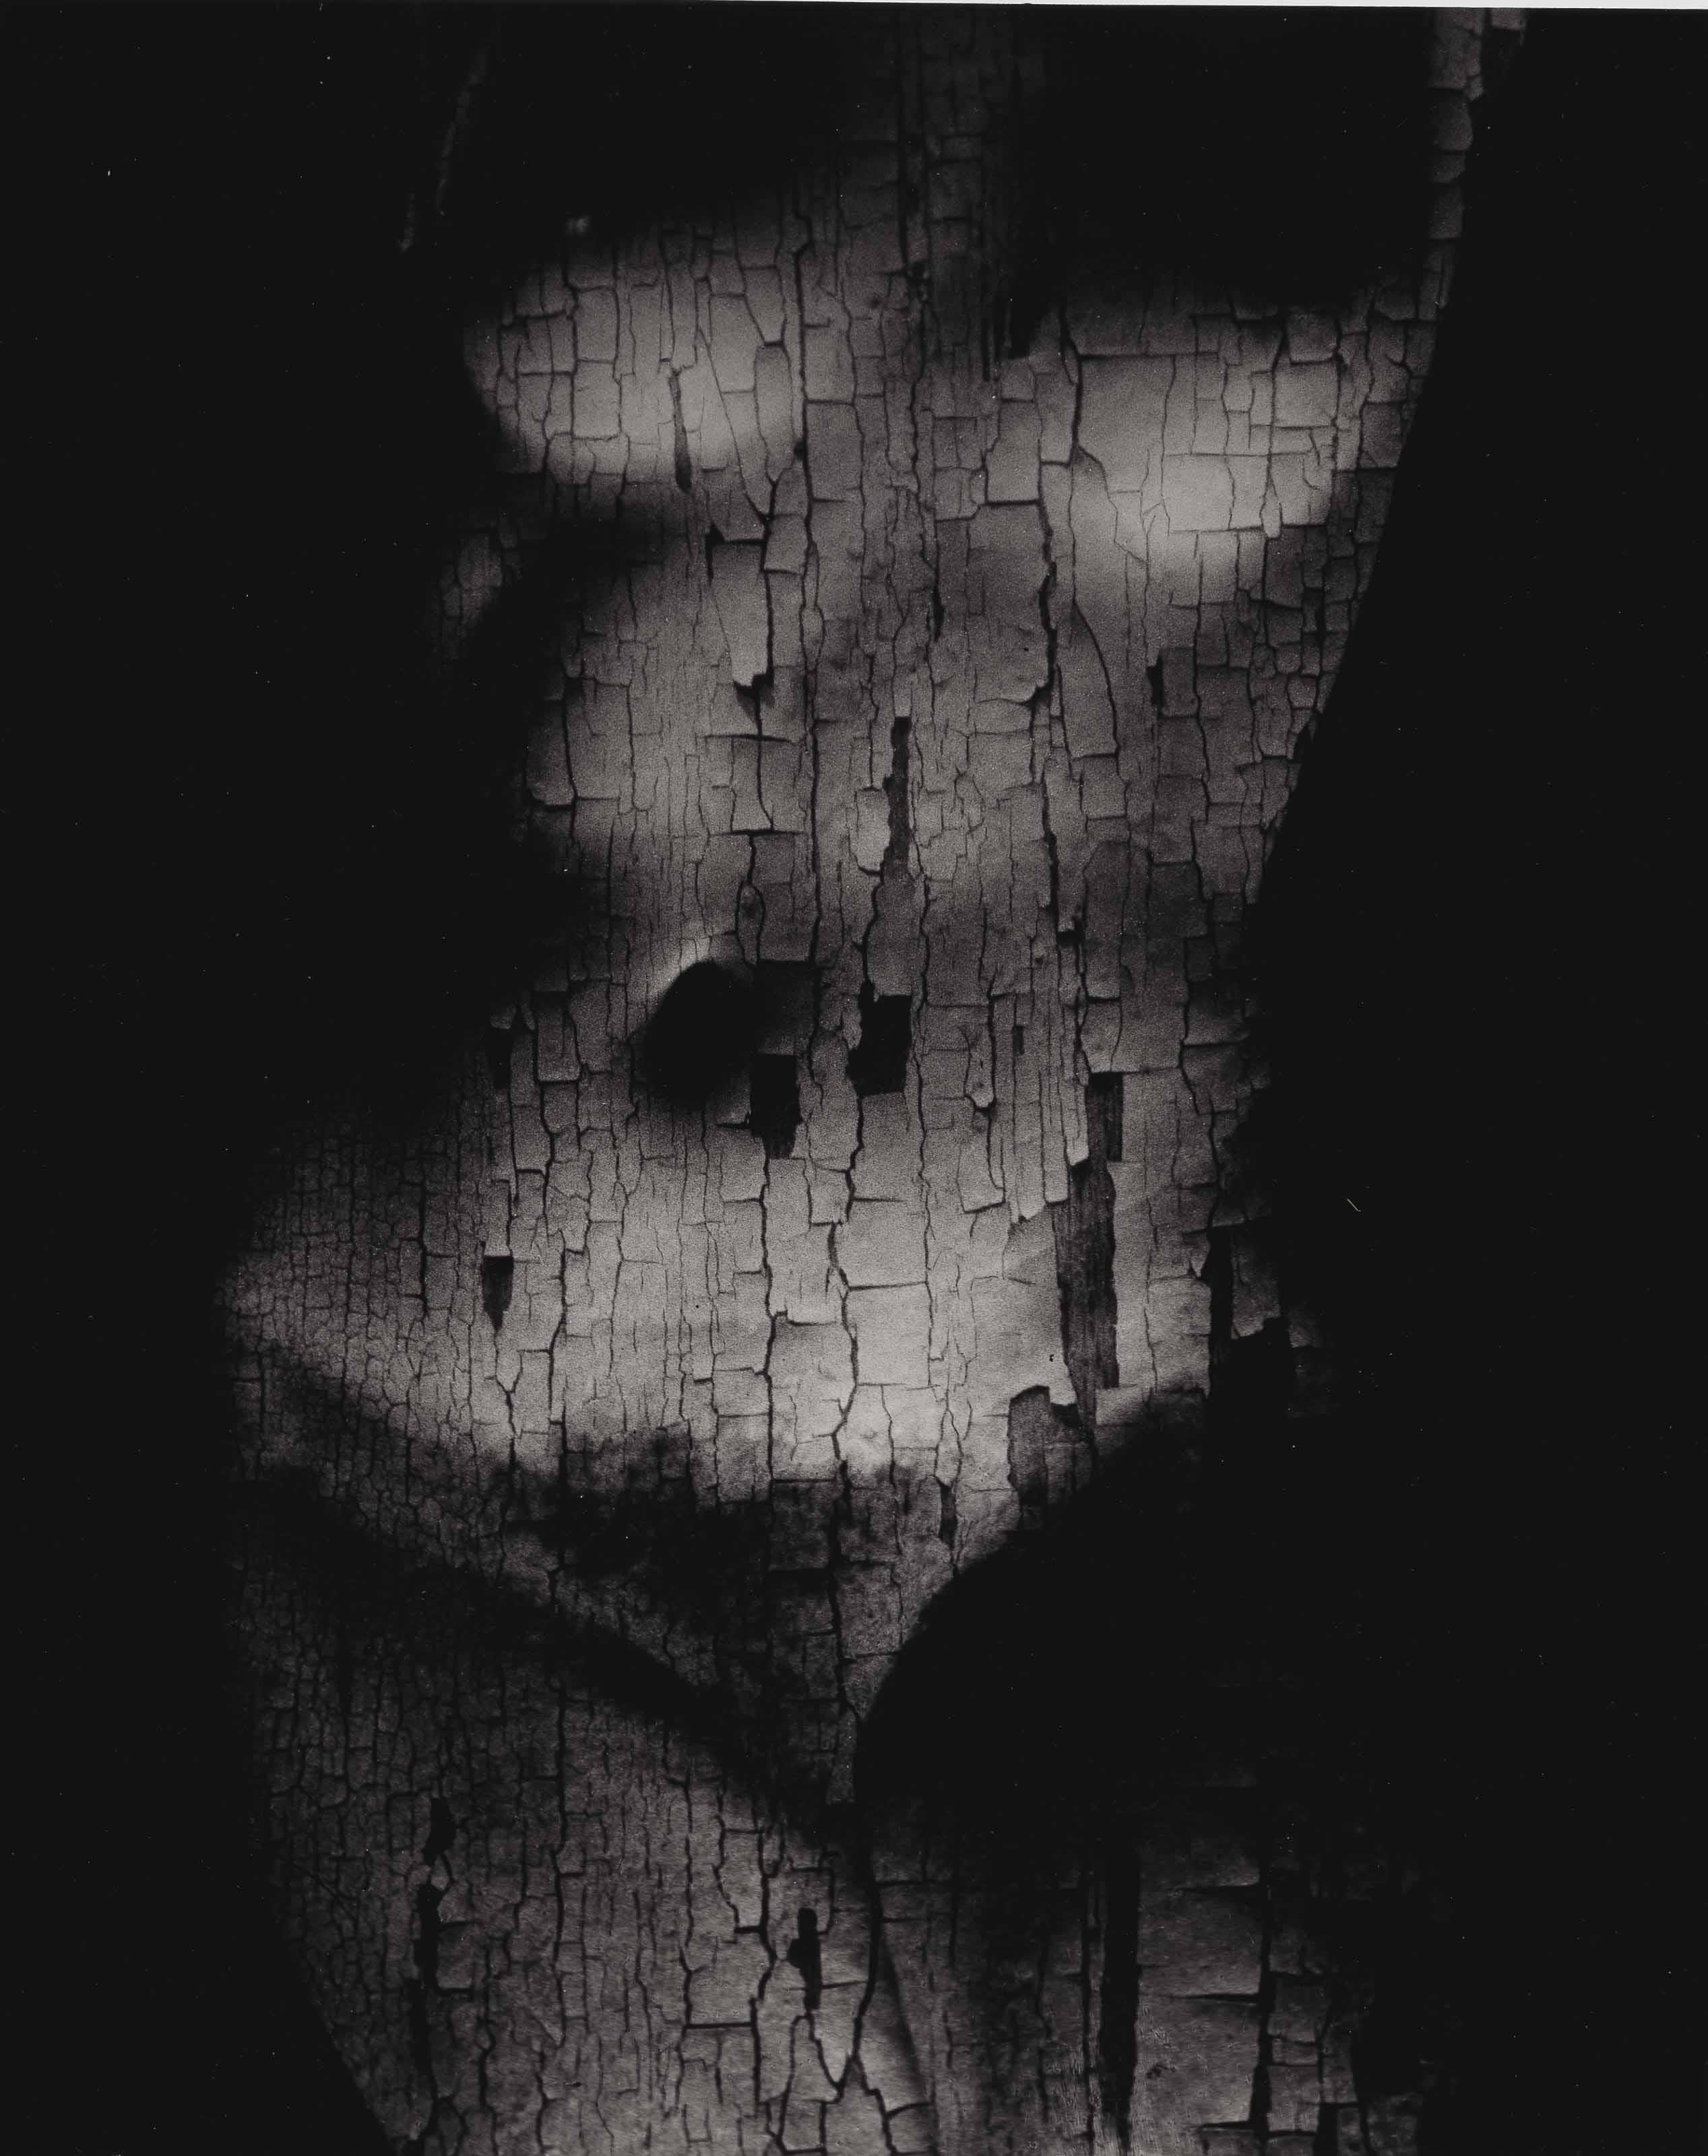 Untitled, 1931